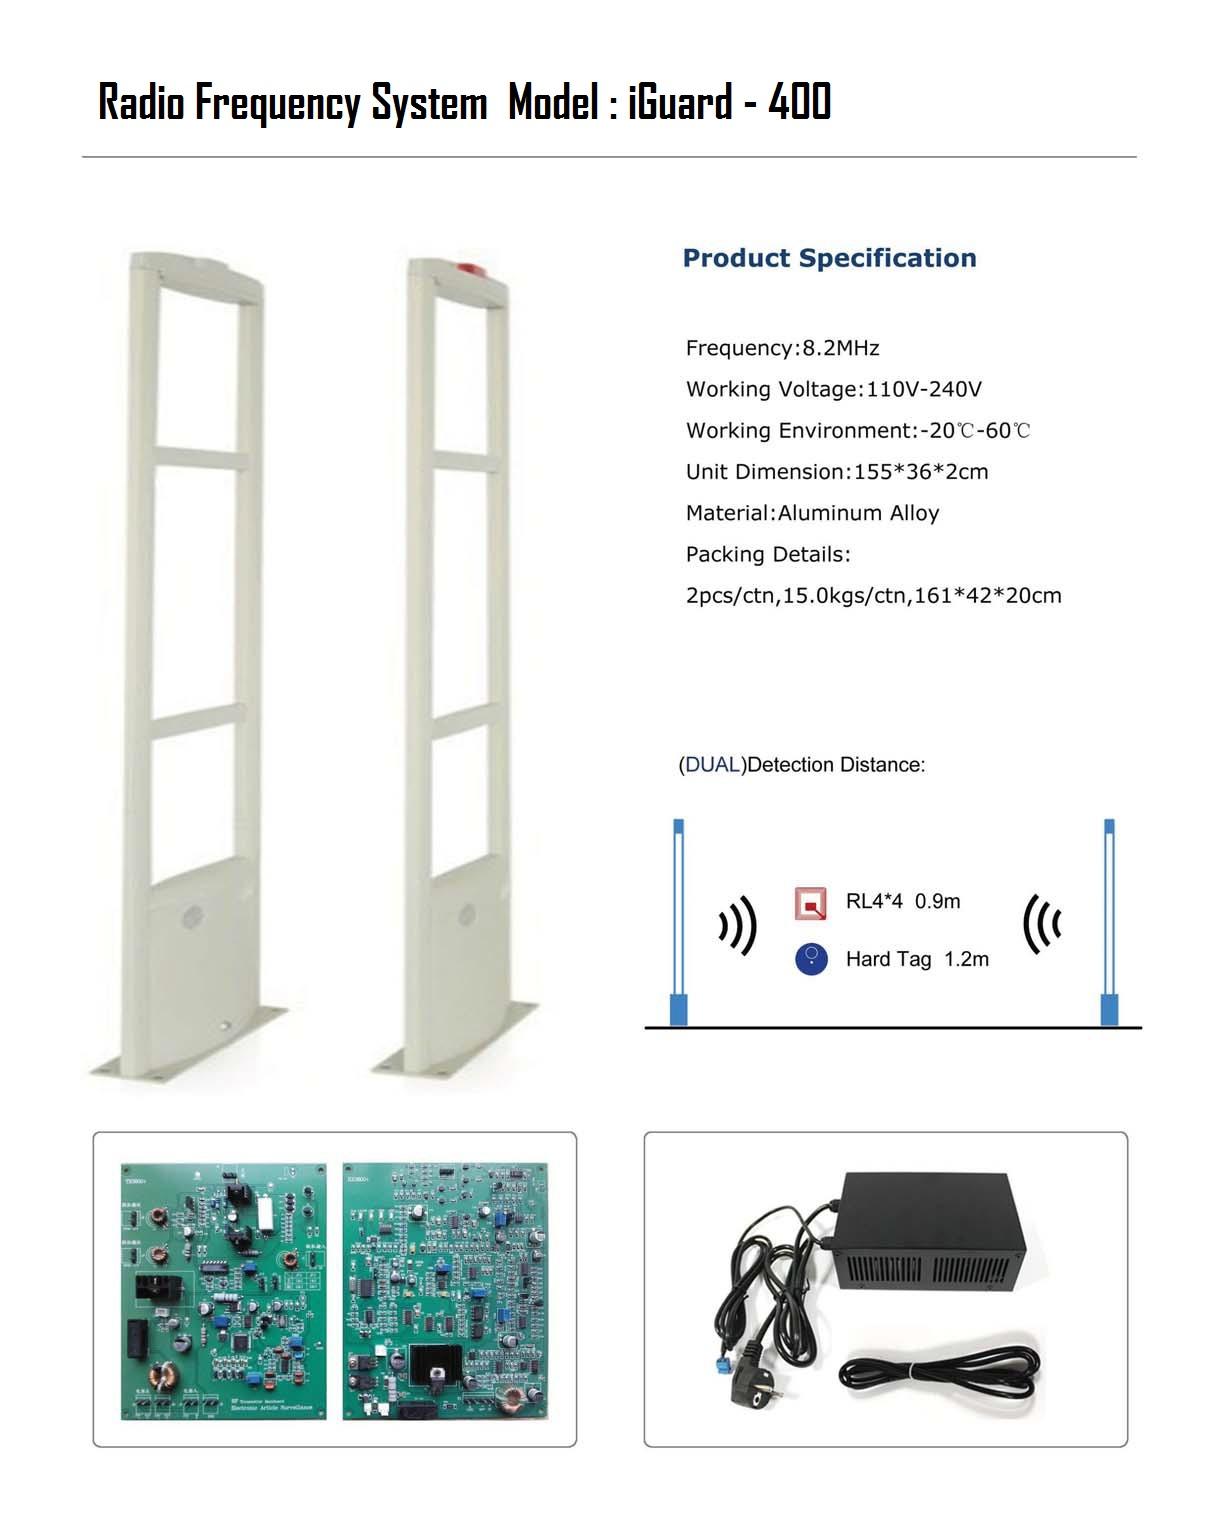 Iguard Design